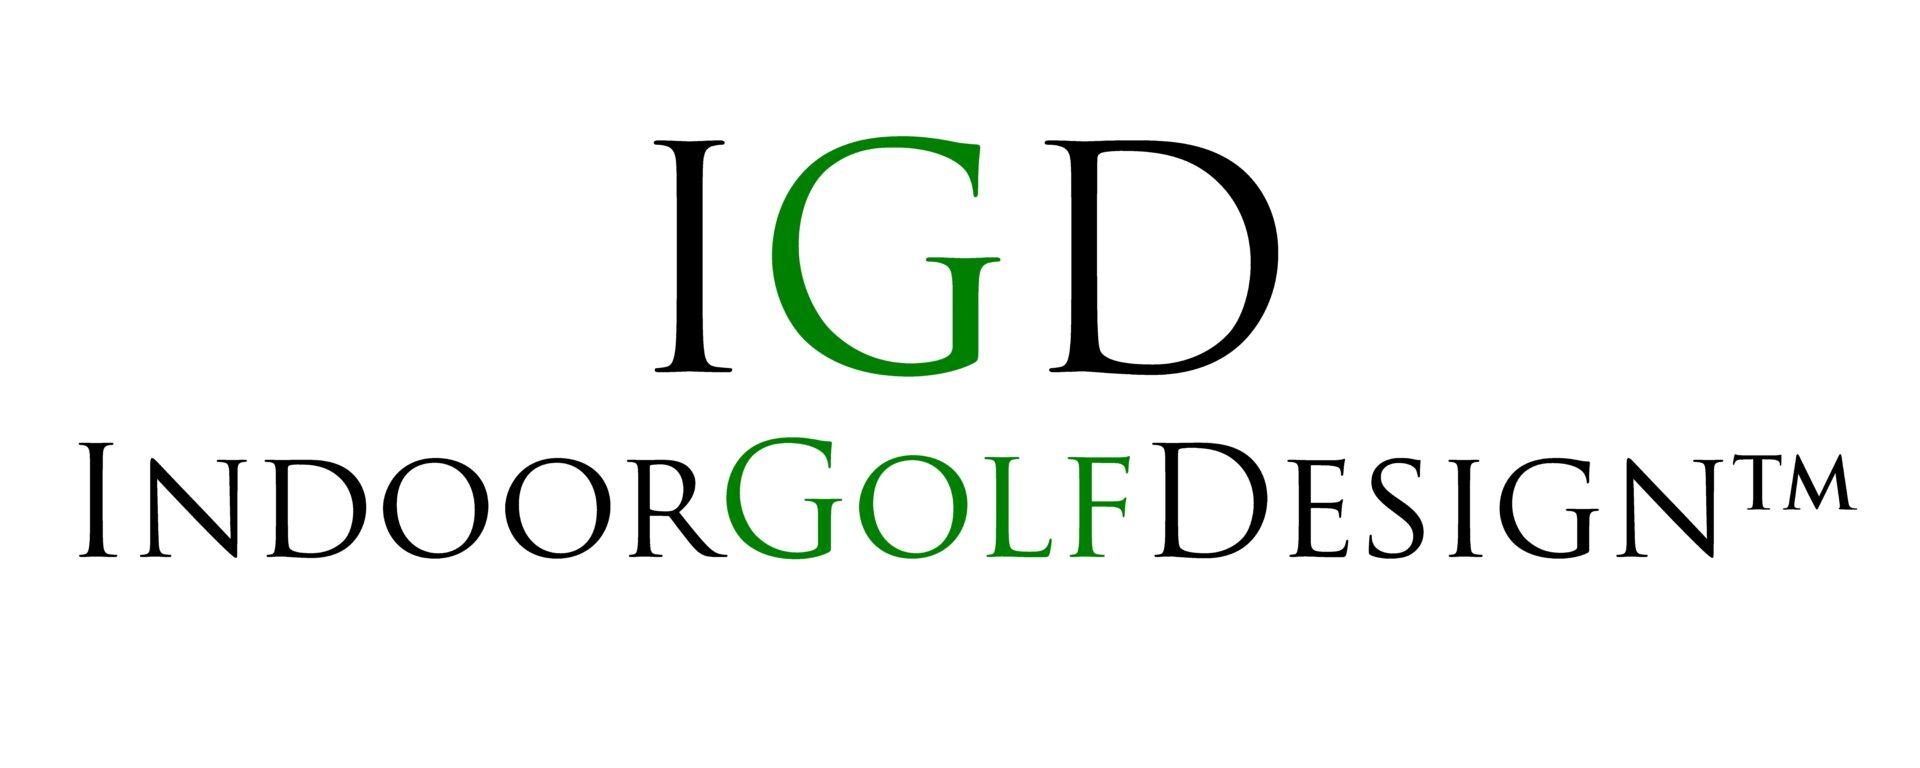 IGD logo tm